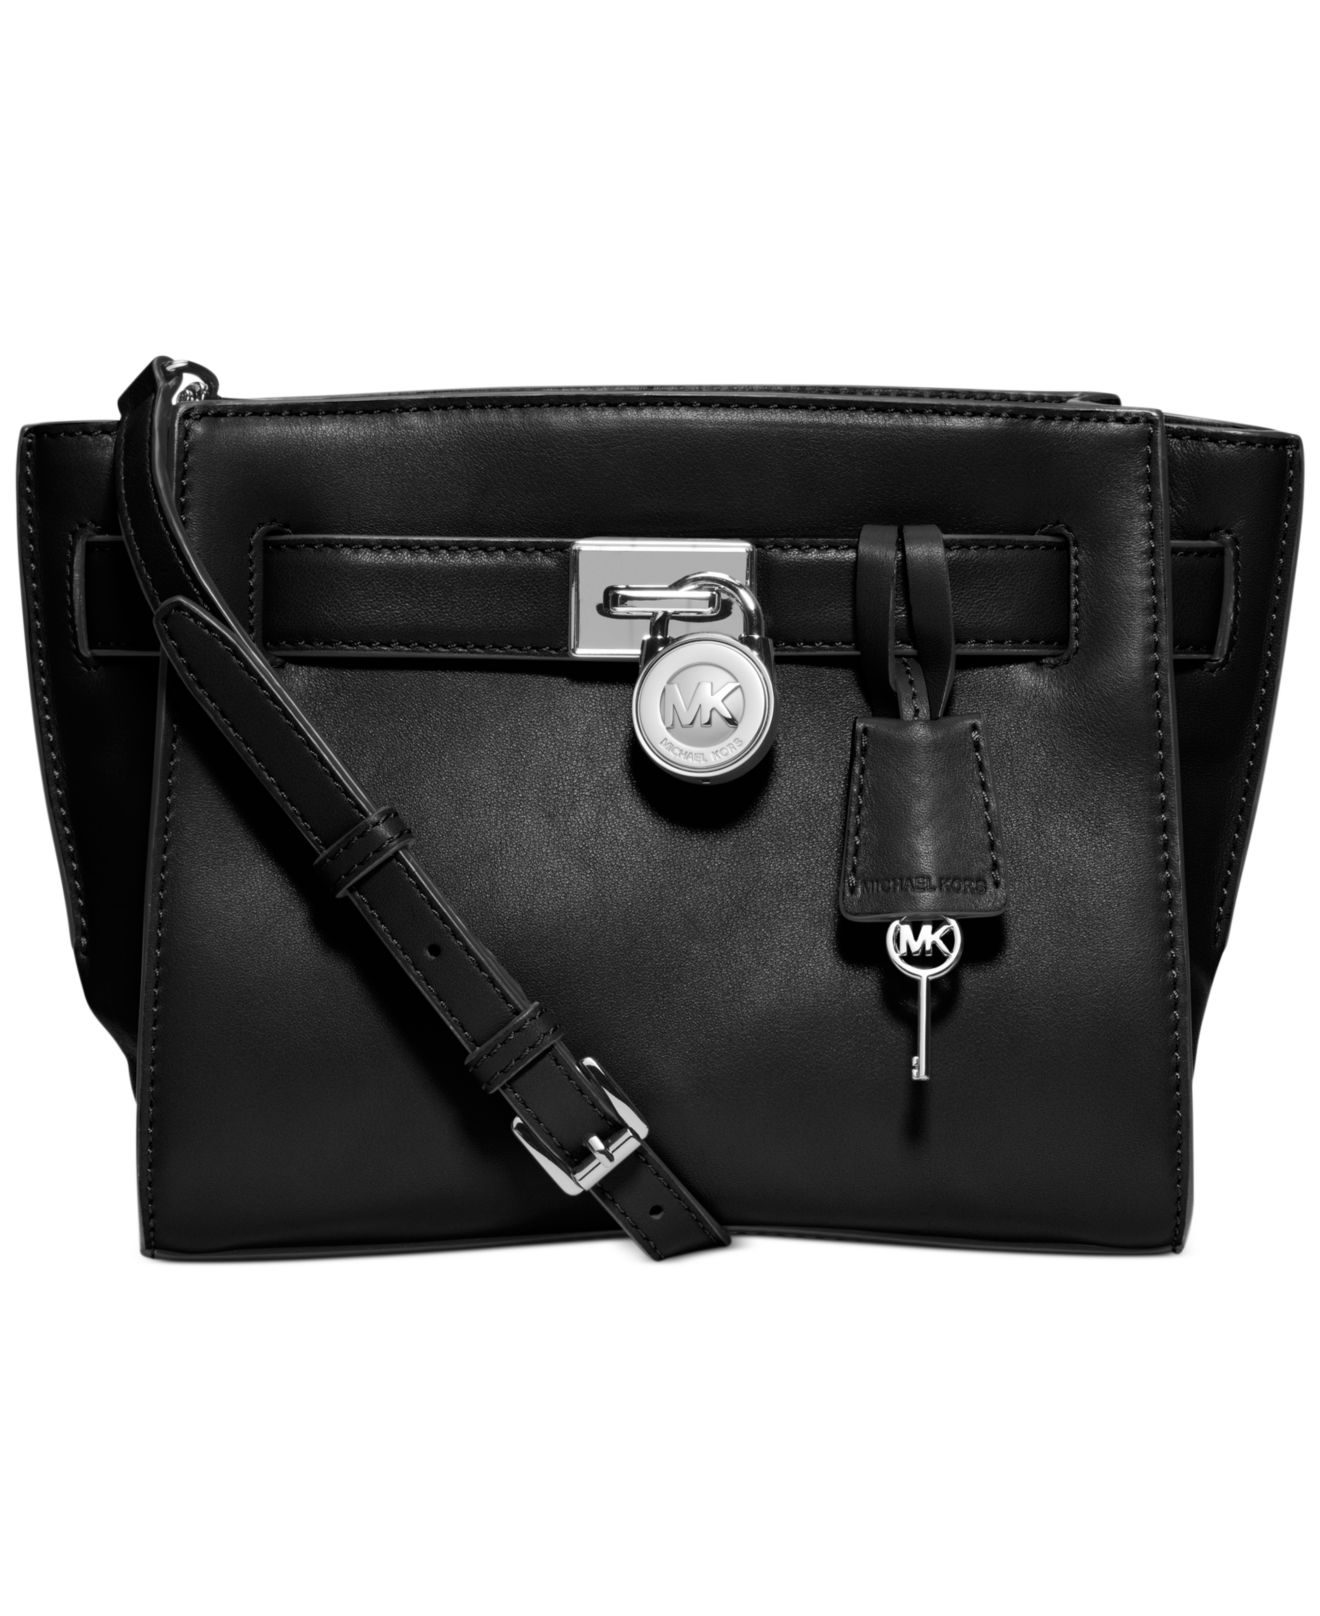 2d636e4b8707 Gallery. Previously sold at: Macy's · Women's Michael By Michael Kors  Hamilton Women's Velvet Shoulder Bags ...